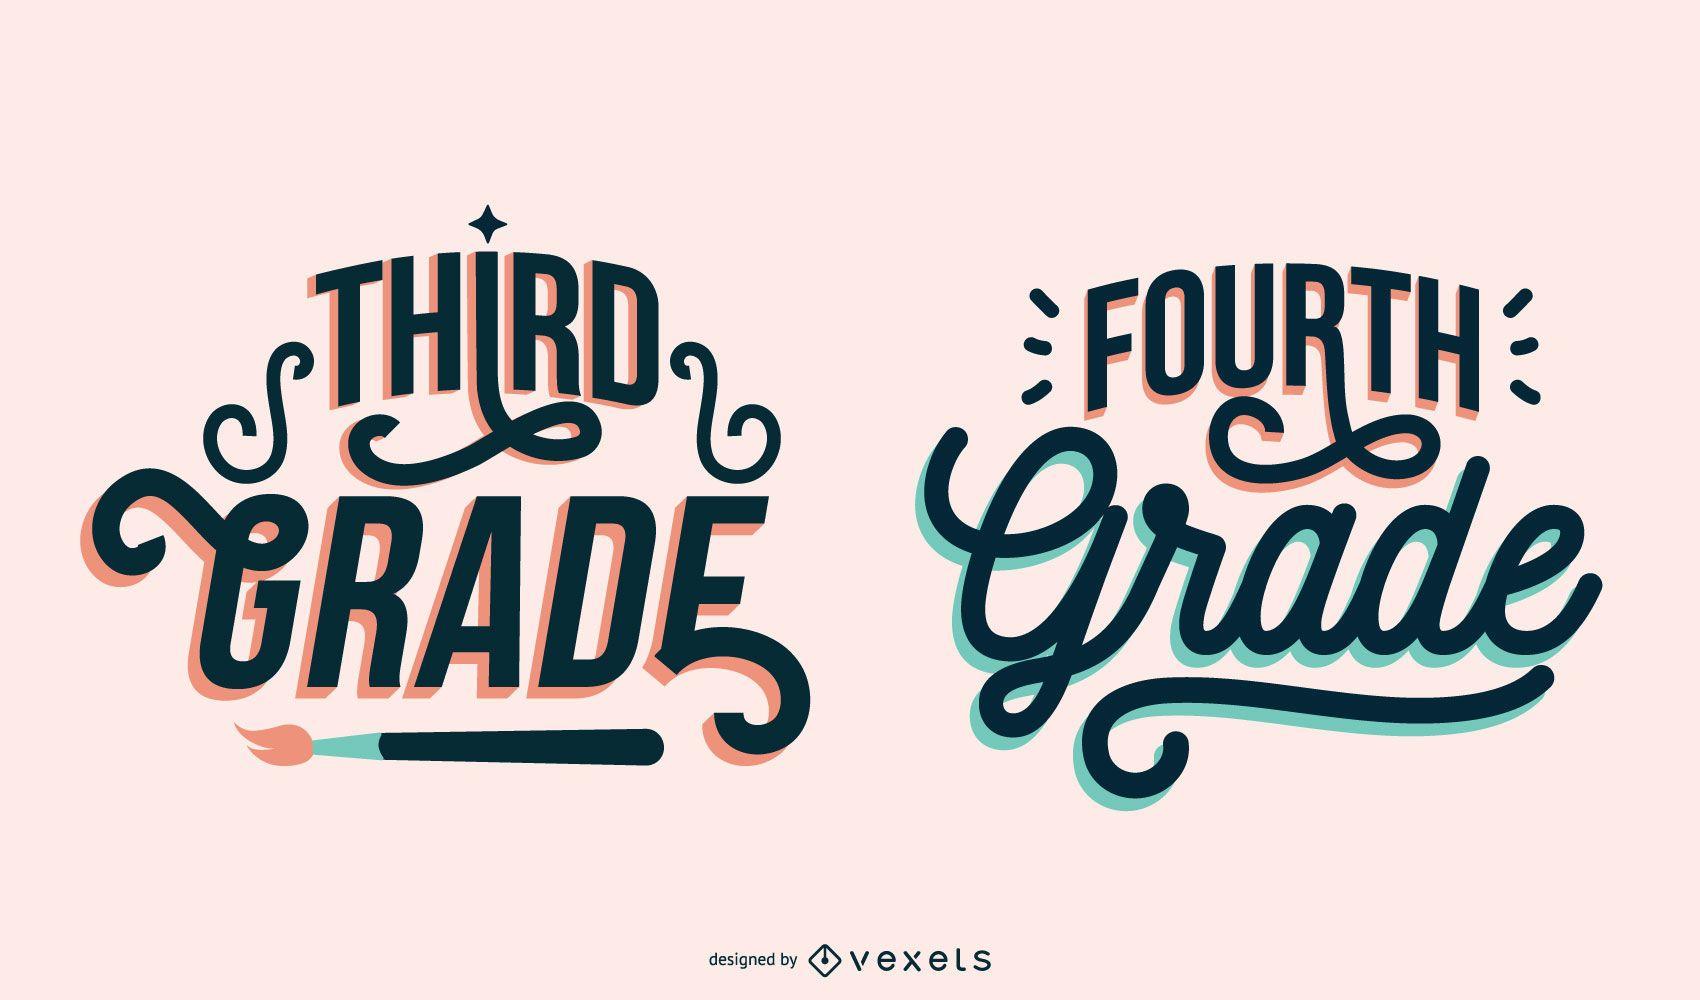 Third fourth grade lettering set